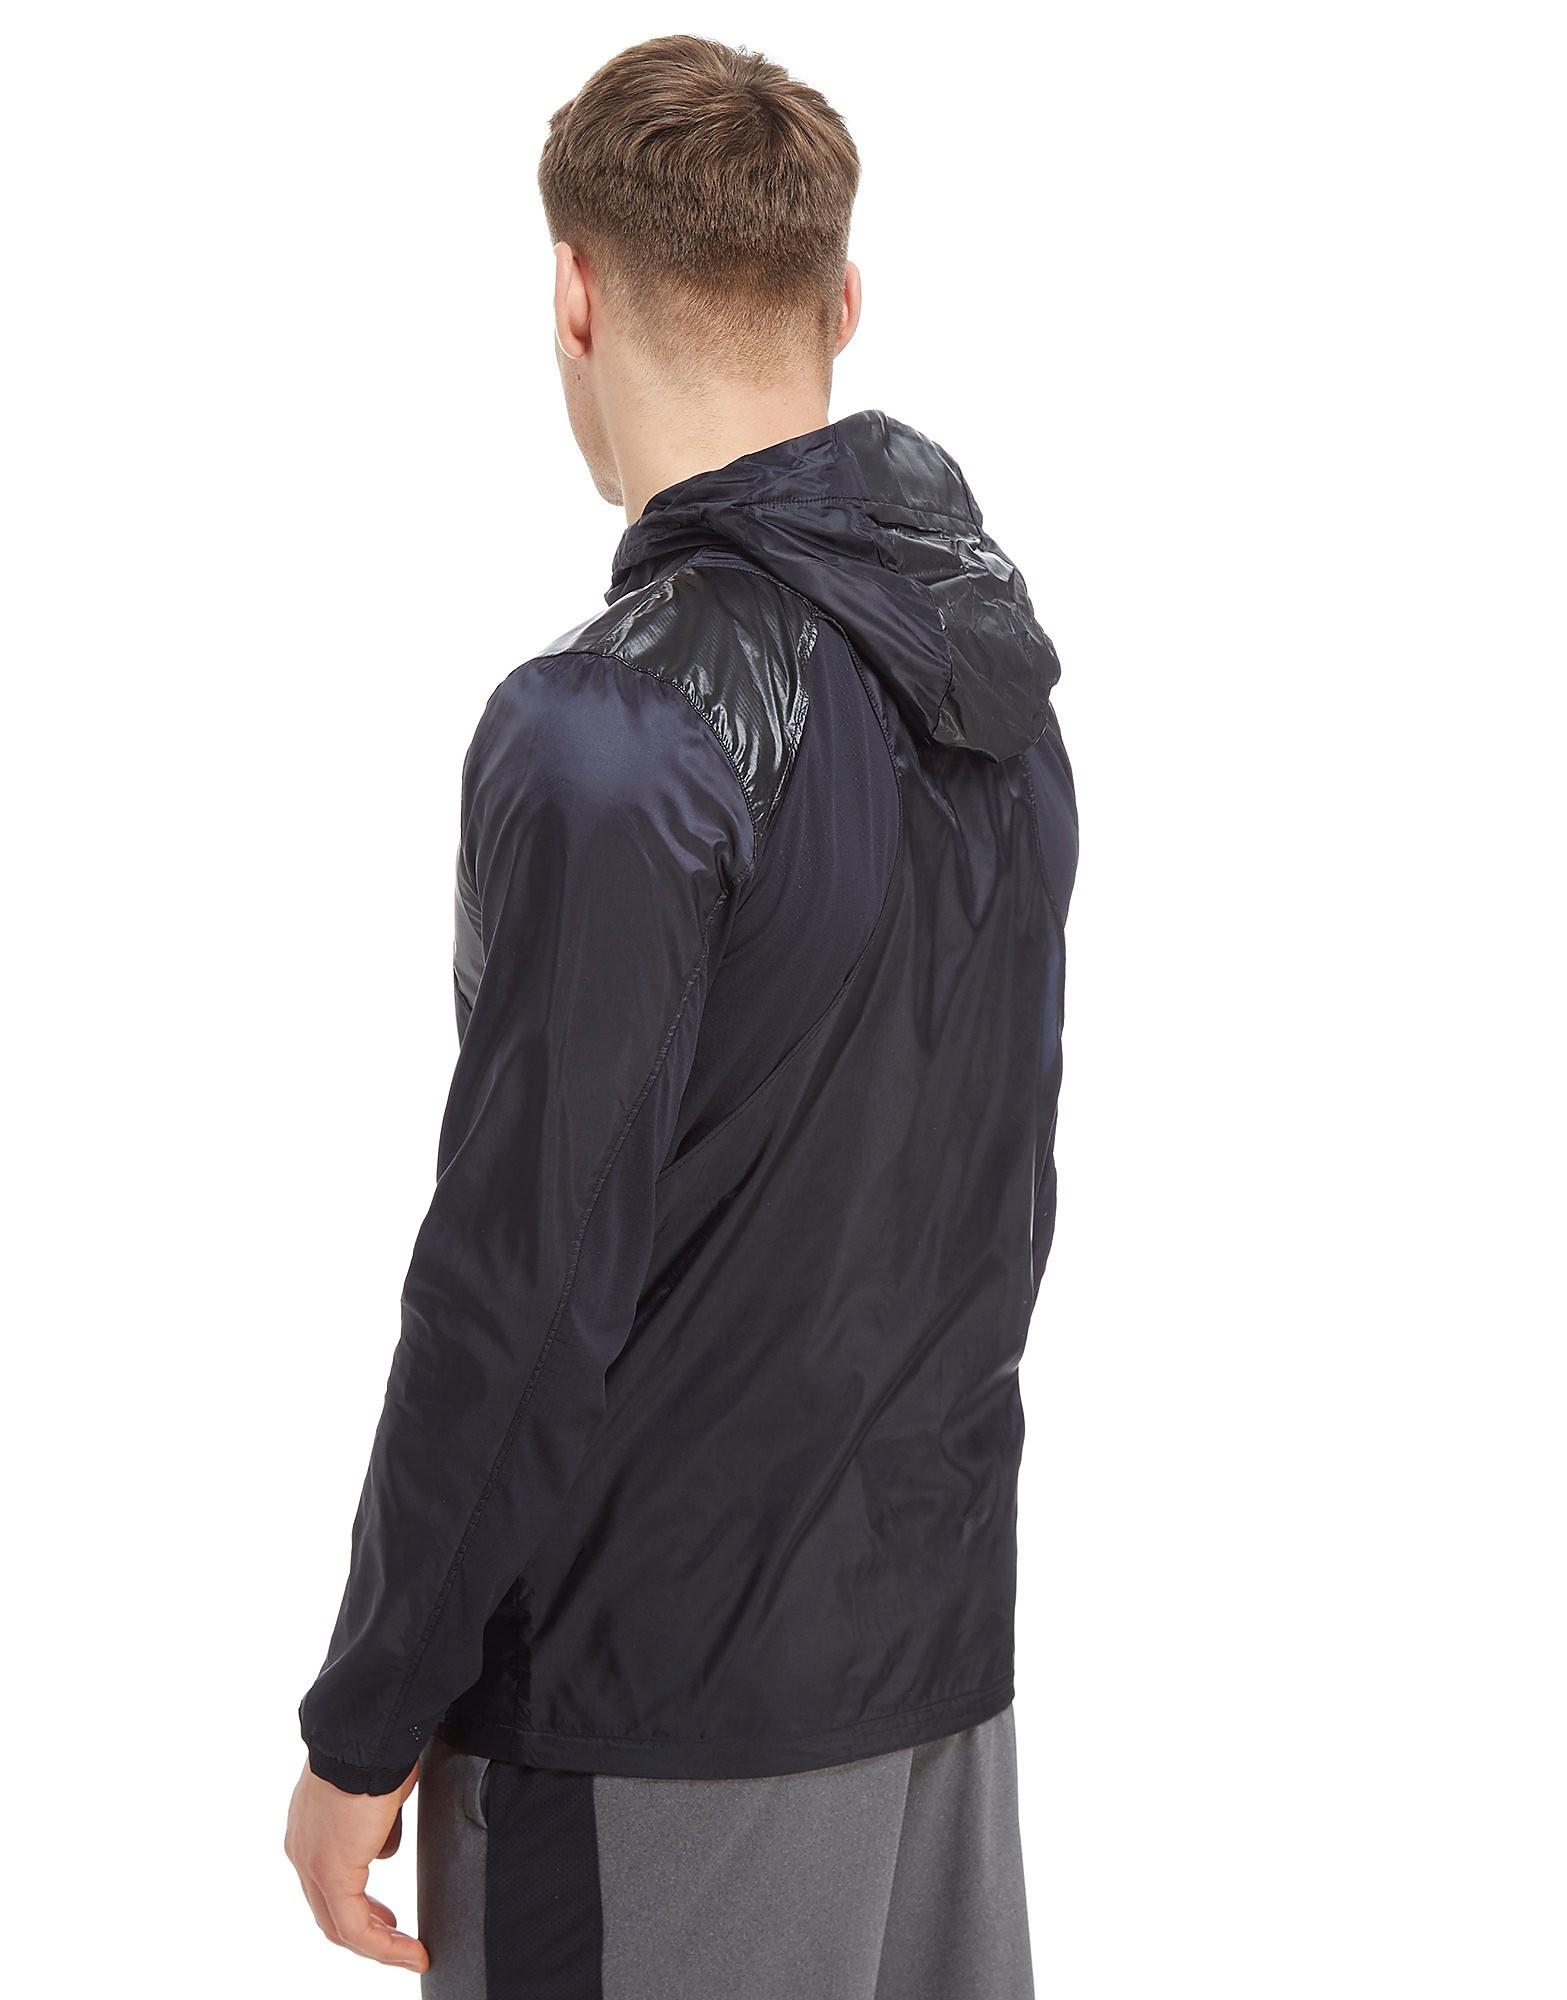 Under Armour Perpetual Full Zip Jacket